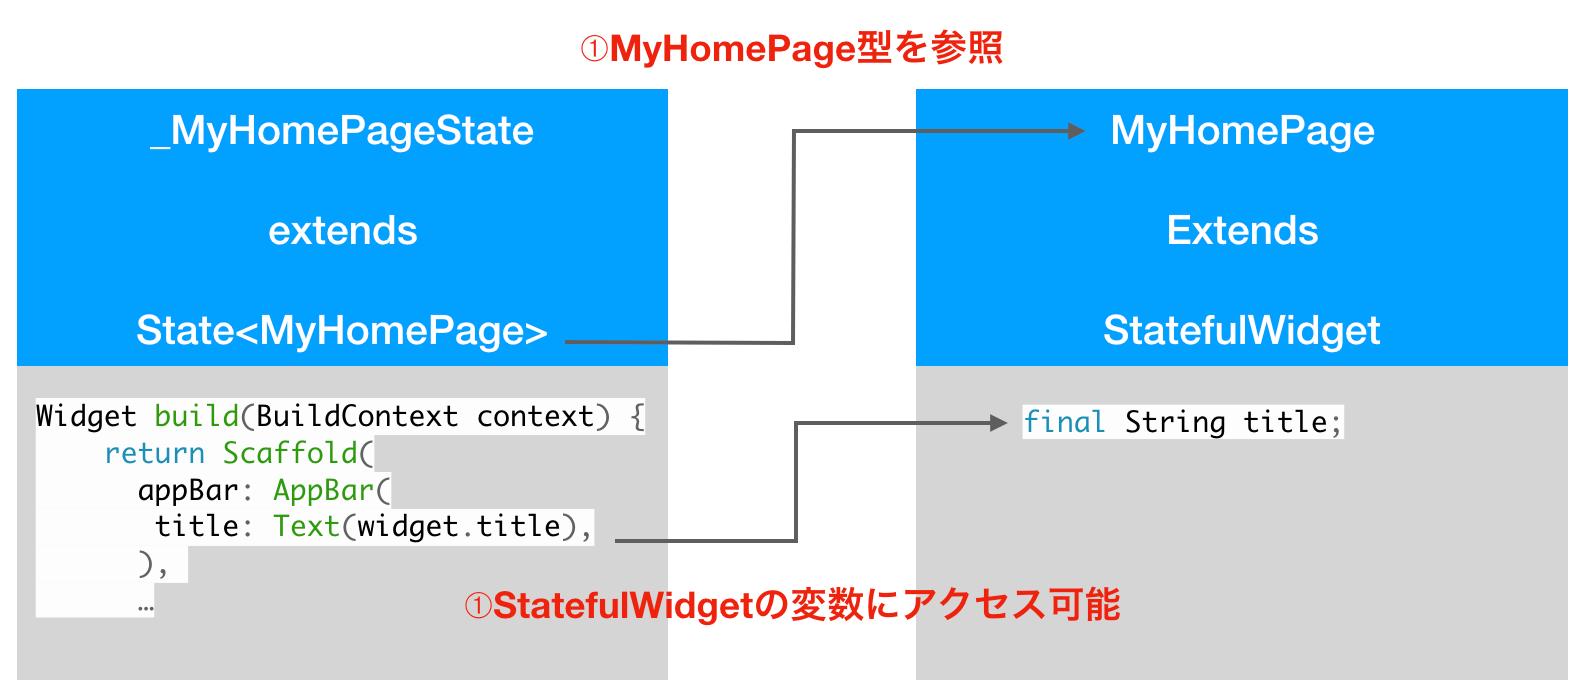 StateがStatefulWidgetの型を定義する理由